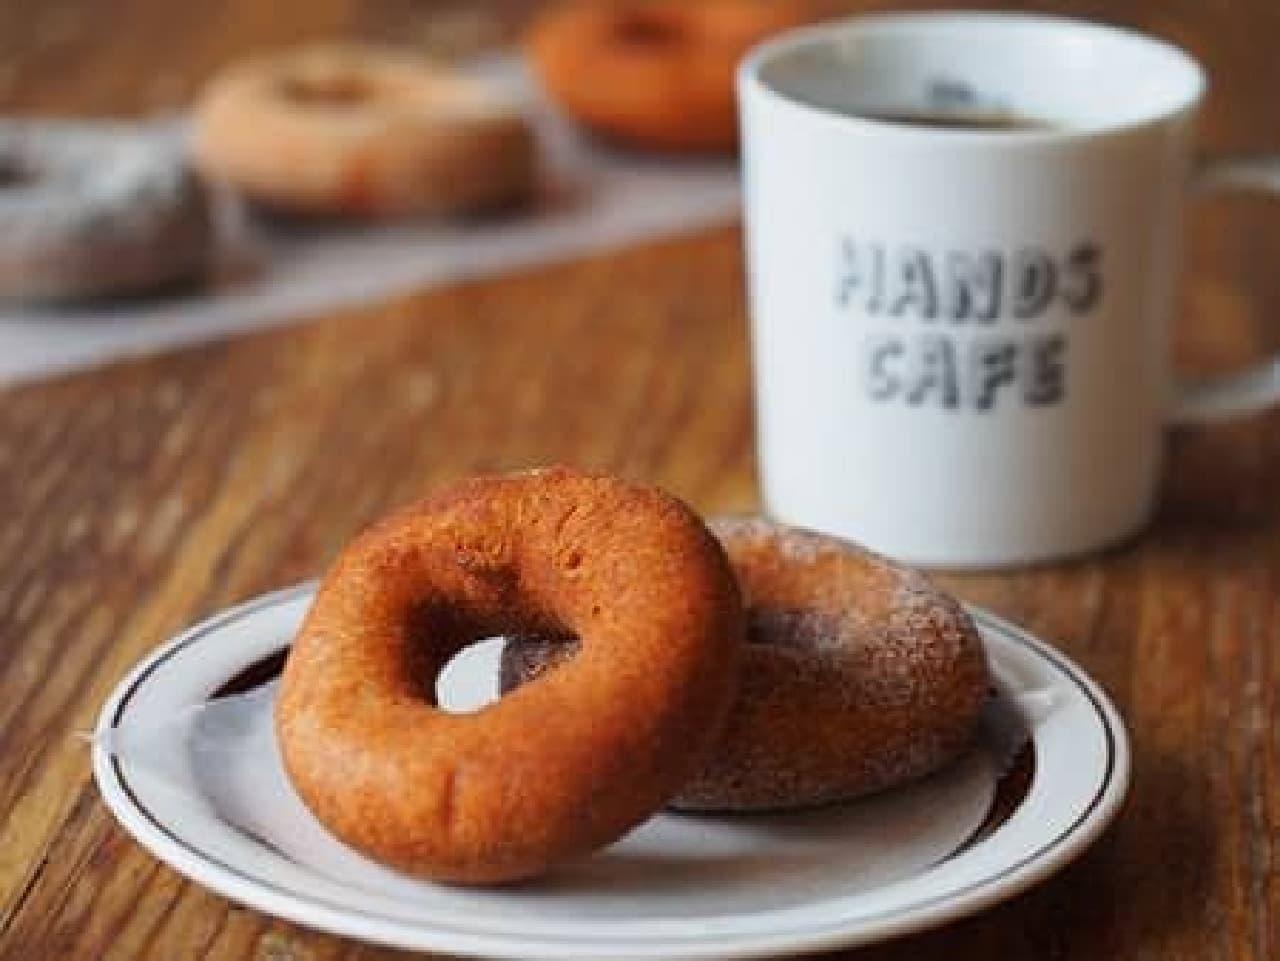 HOA CAFE とコラボの nico ドーナツ